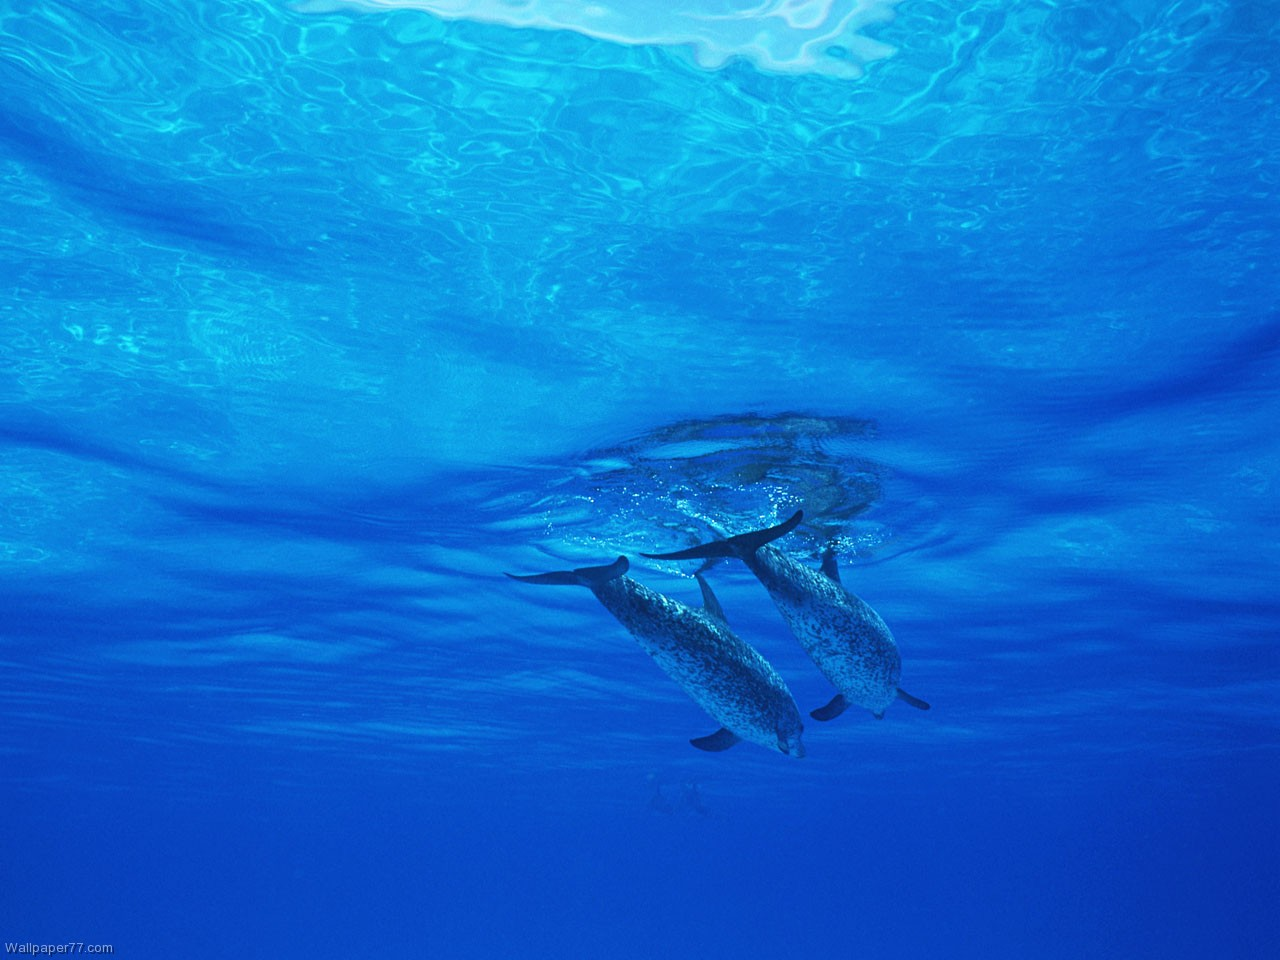 Dolphin Brothers 1280x960 pixels Wallpapers tagged Mammal Wallpaper 1280x960